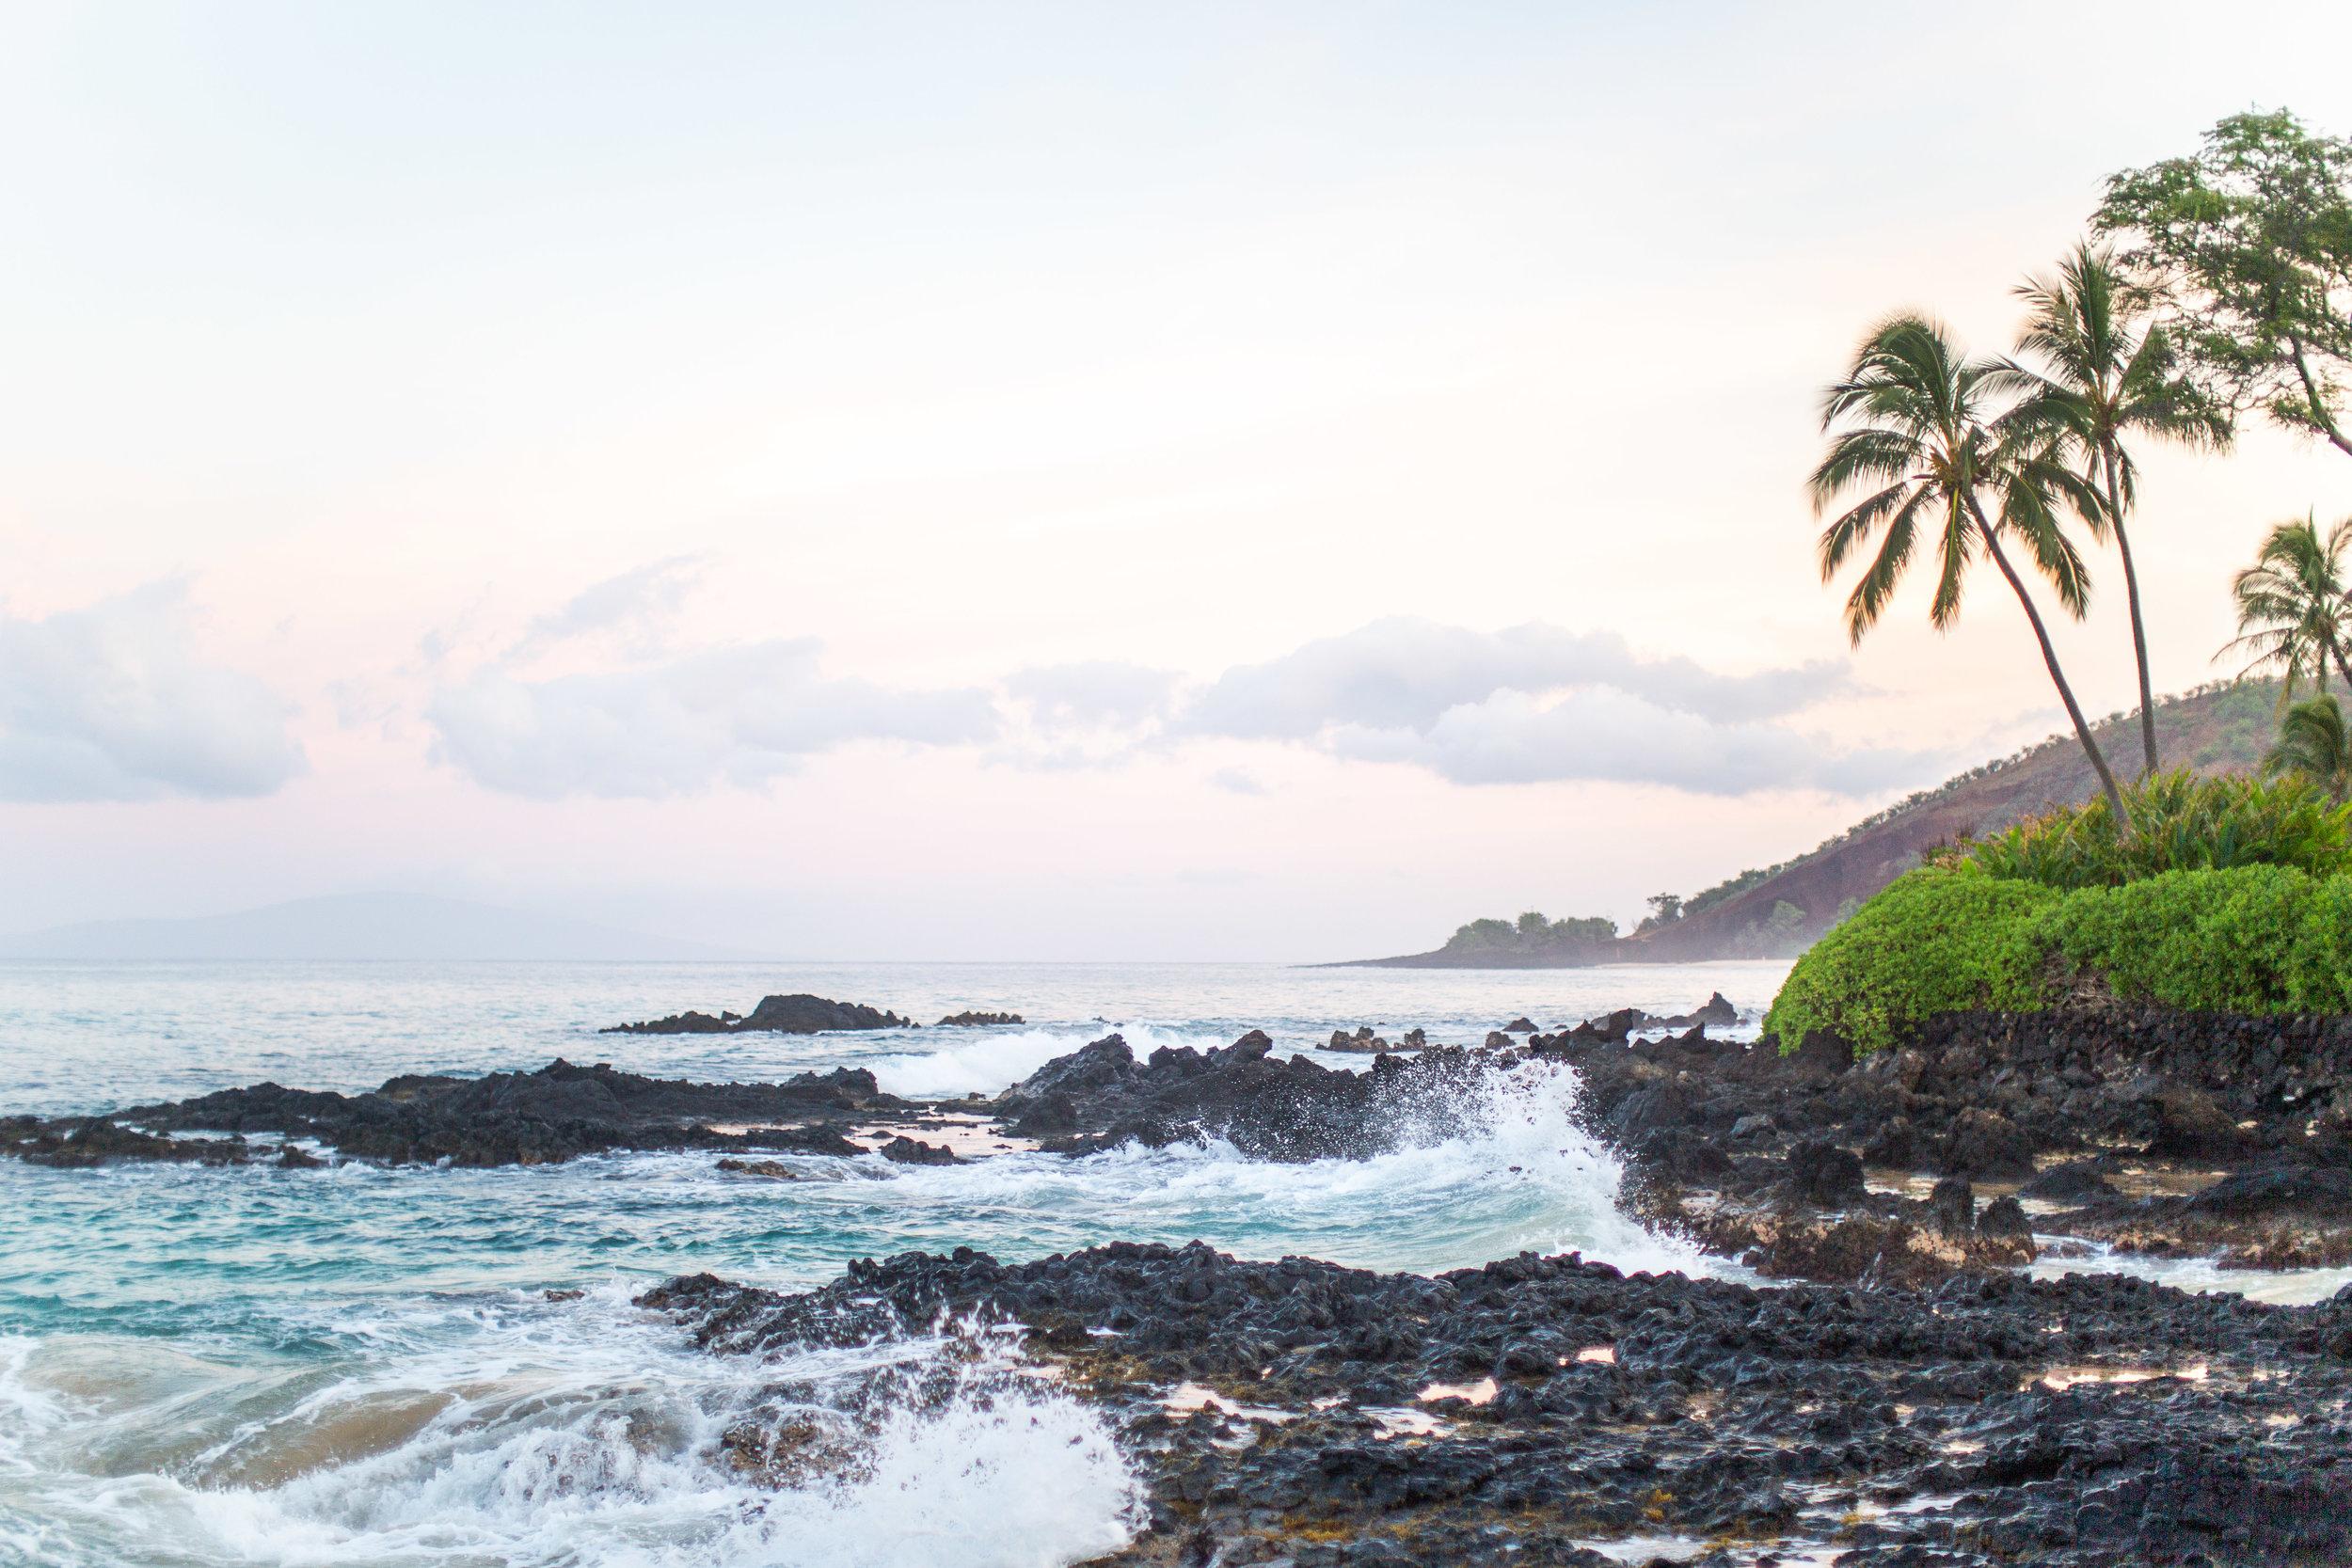 fizz-fade-hawaii-sunrise-stripes2-66.jpg